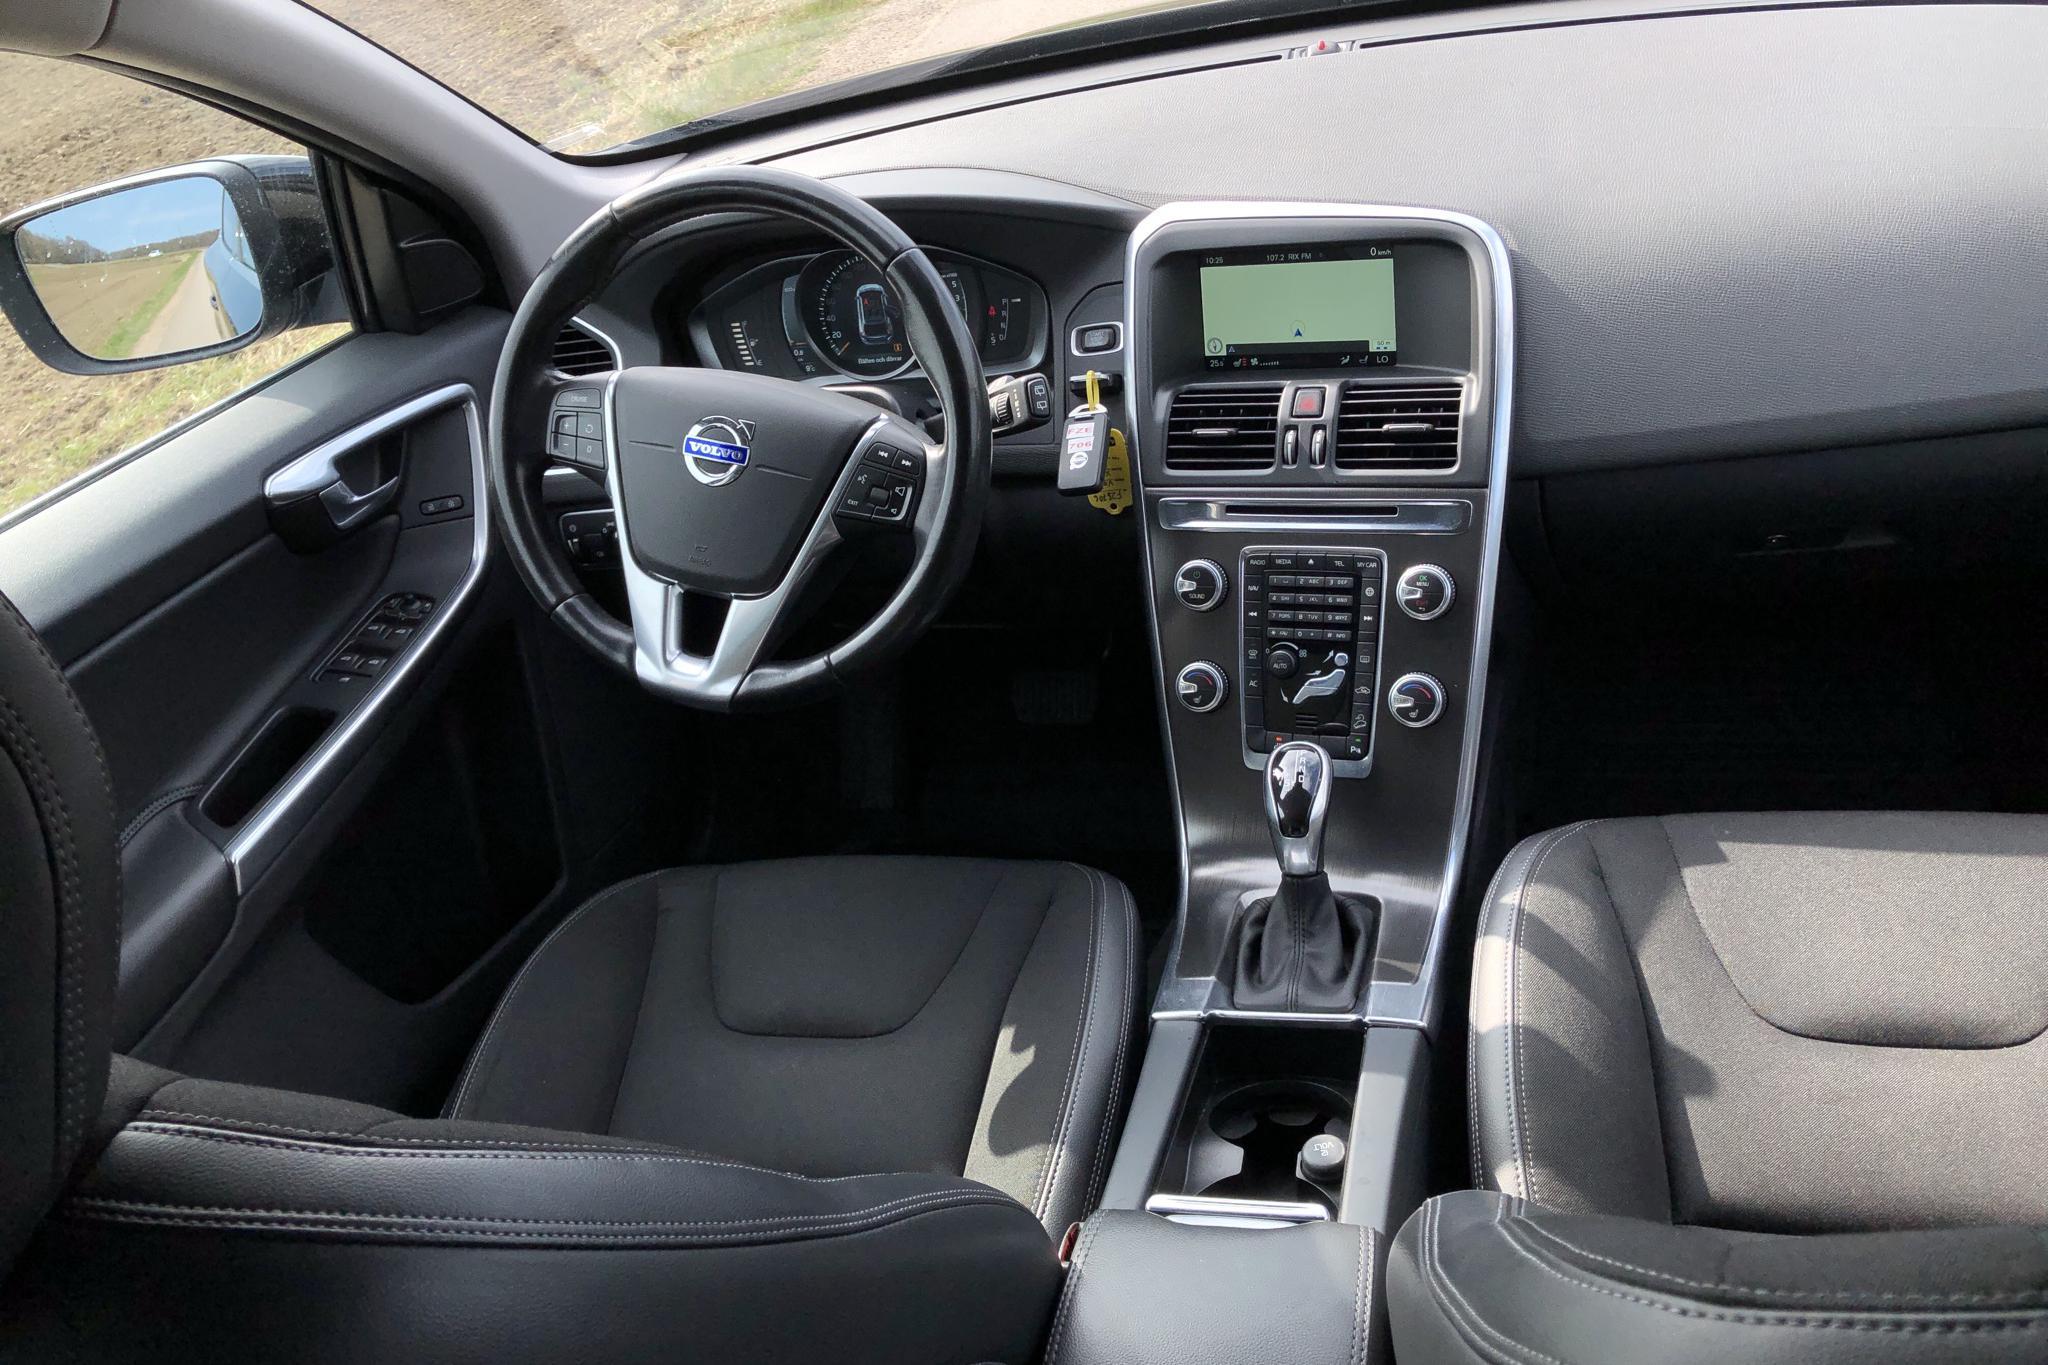 Volvo XC60 D4 AWD (190hk) - 135 020 km - Automatic - black - 2016